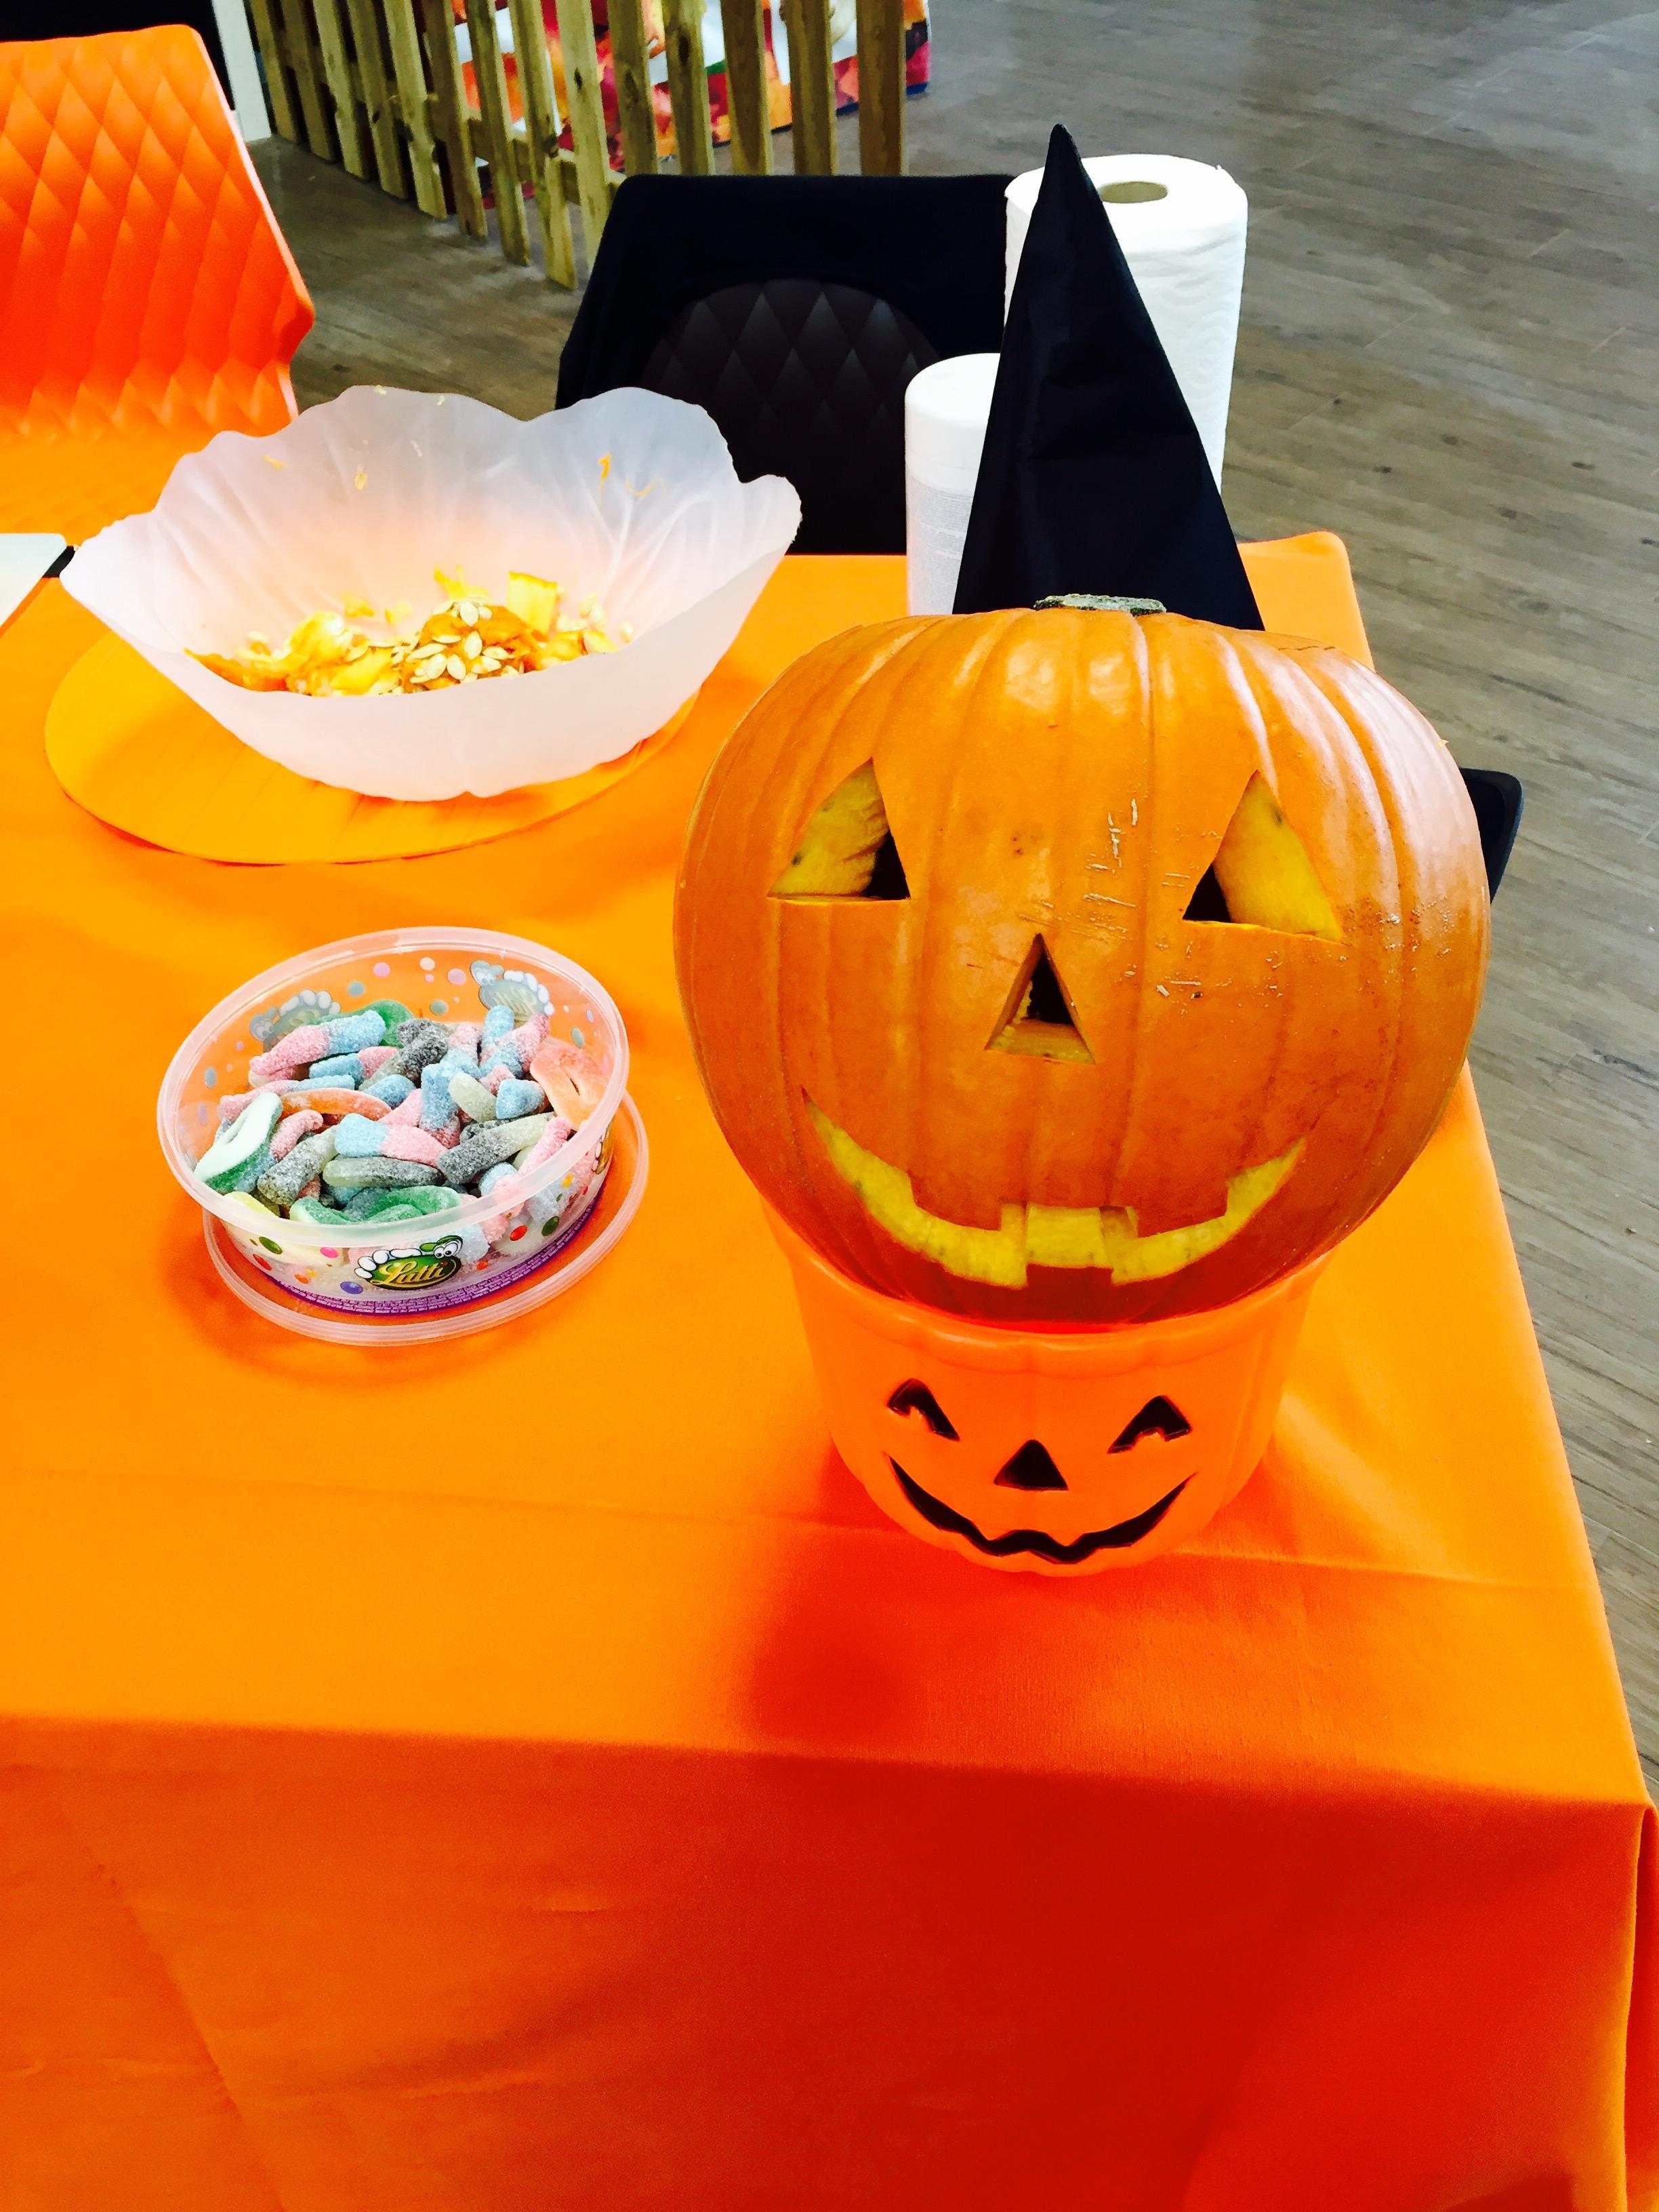 Creation of Pumpkins